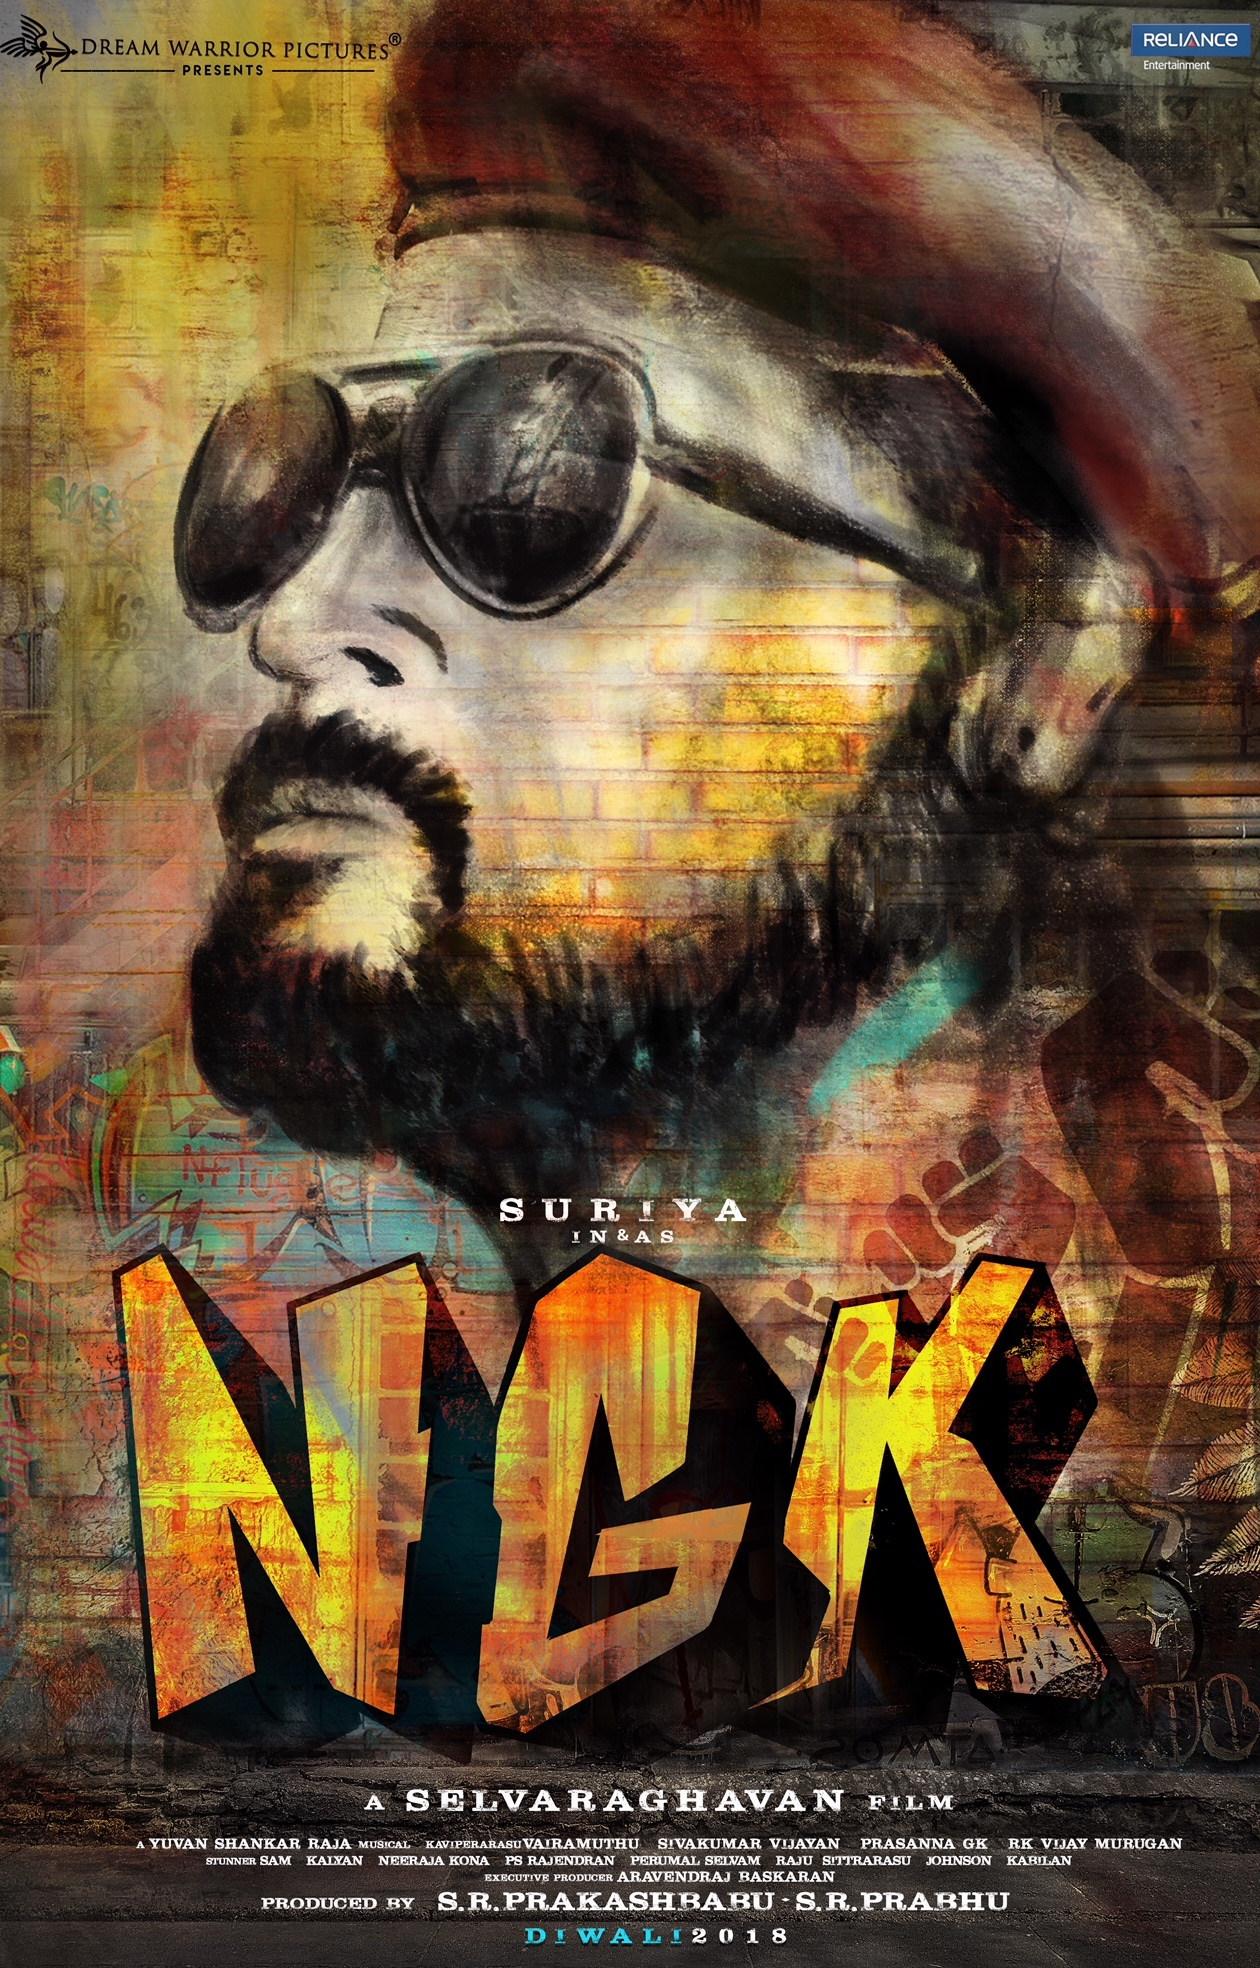 Suriya NGK Movie Teaser Release on Suriya's birthday July 23